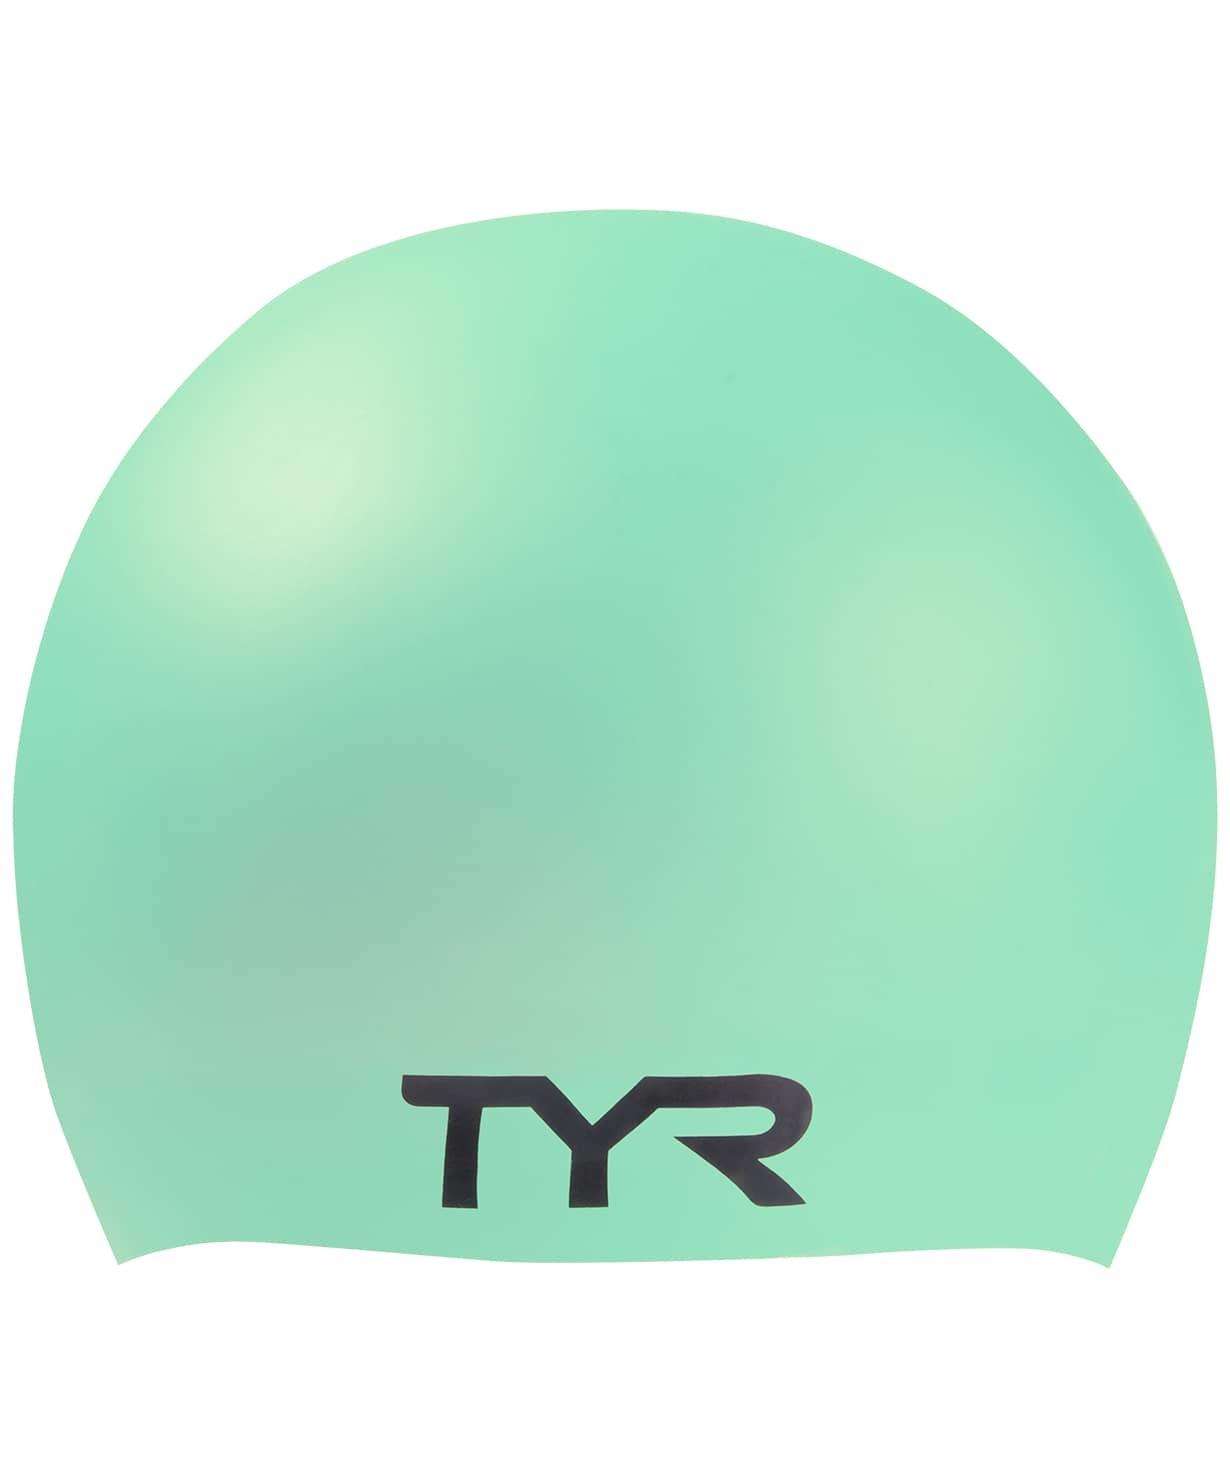 Шапочка для плавания Long Hair Wrinkle-Free Silicone Cap, силикон, LCSL/332, голубой